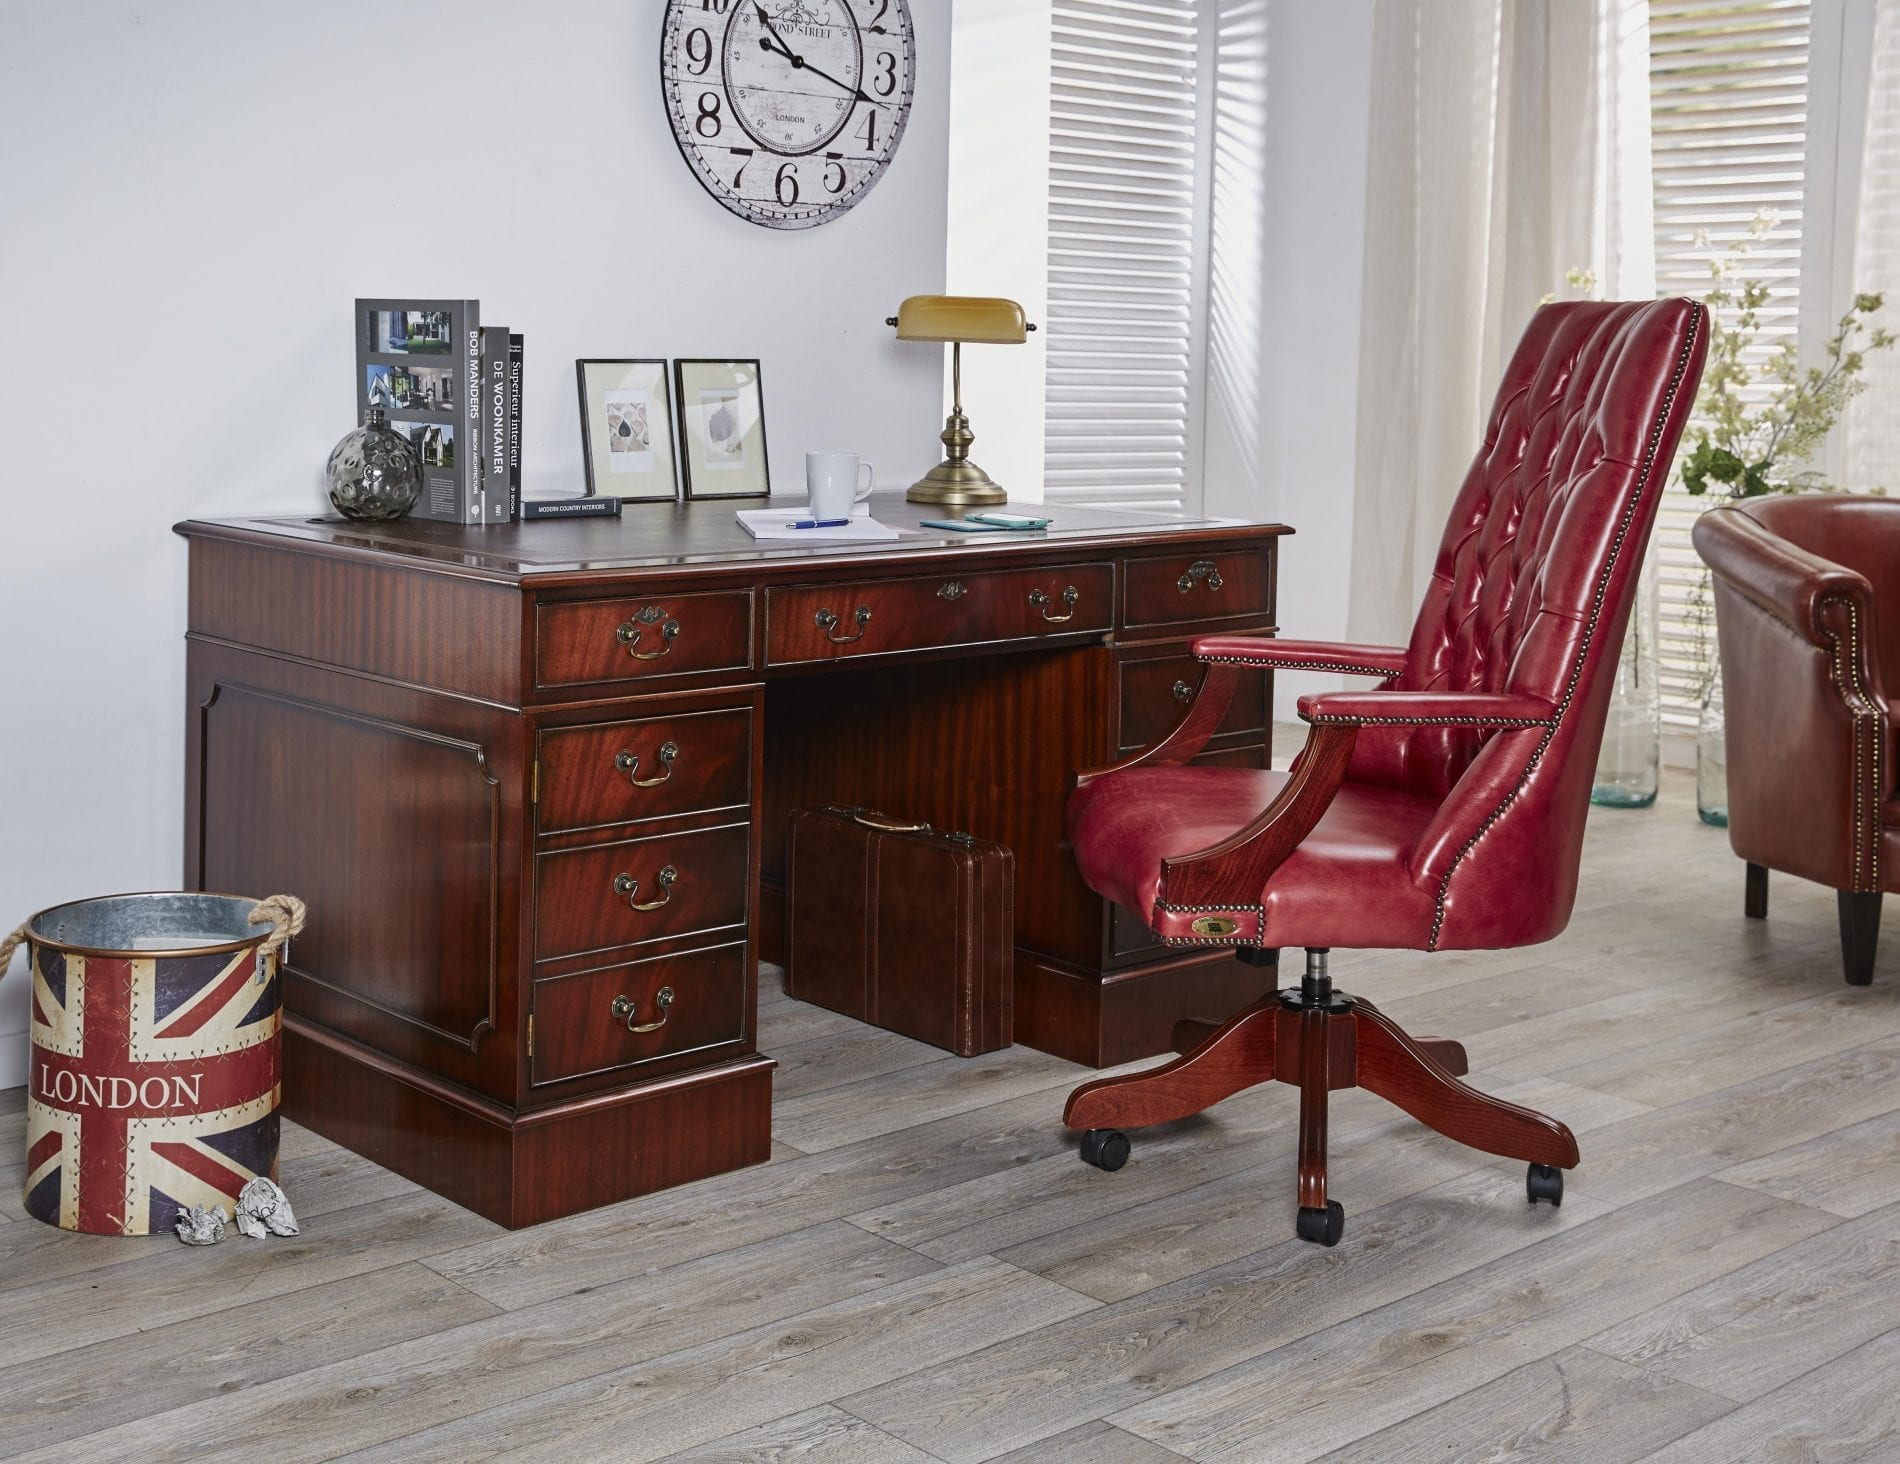 delta-chesterfield-bureau-en-library-swivel-crystal-camay-bureaustoel